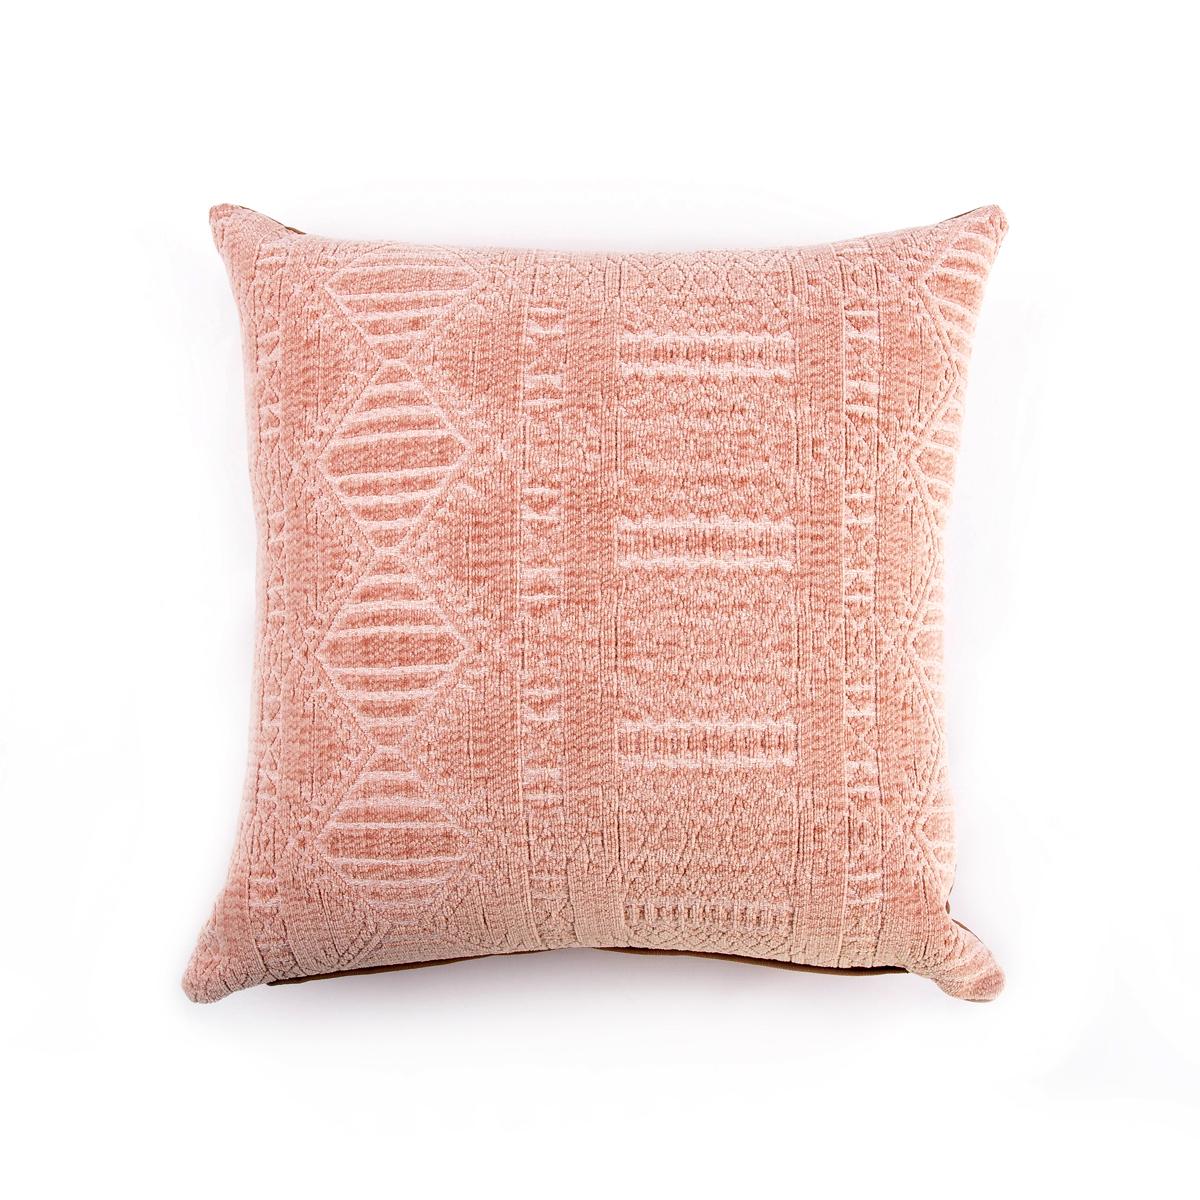 Декоративная наволочка Arya Arya Calanthia Цвет: Розовый (40х40)